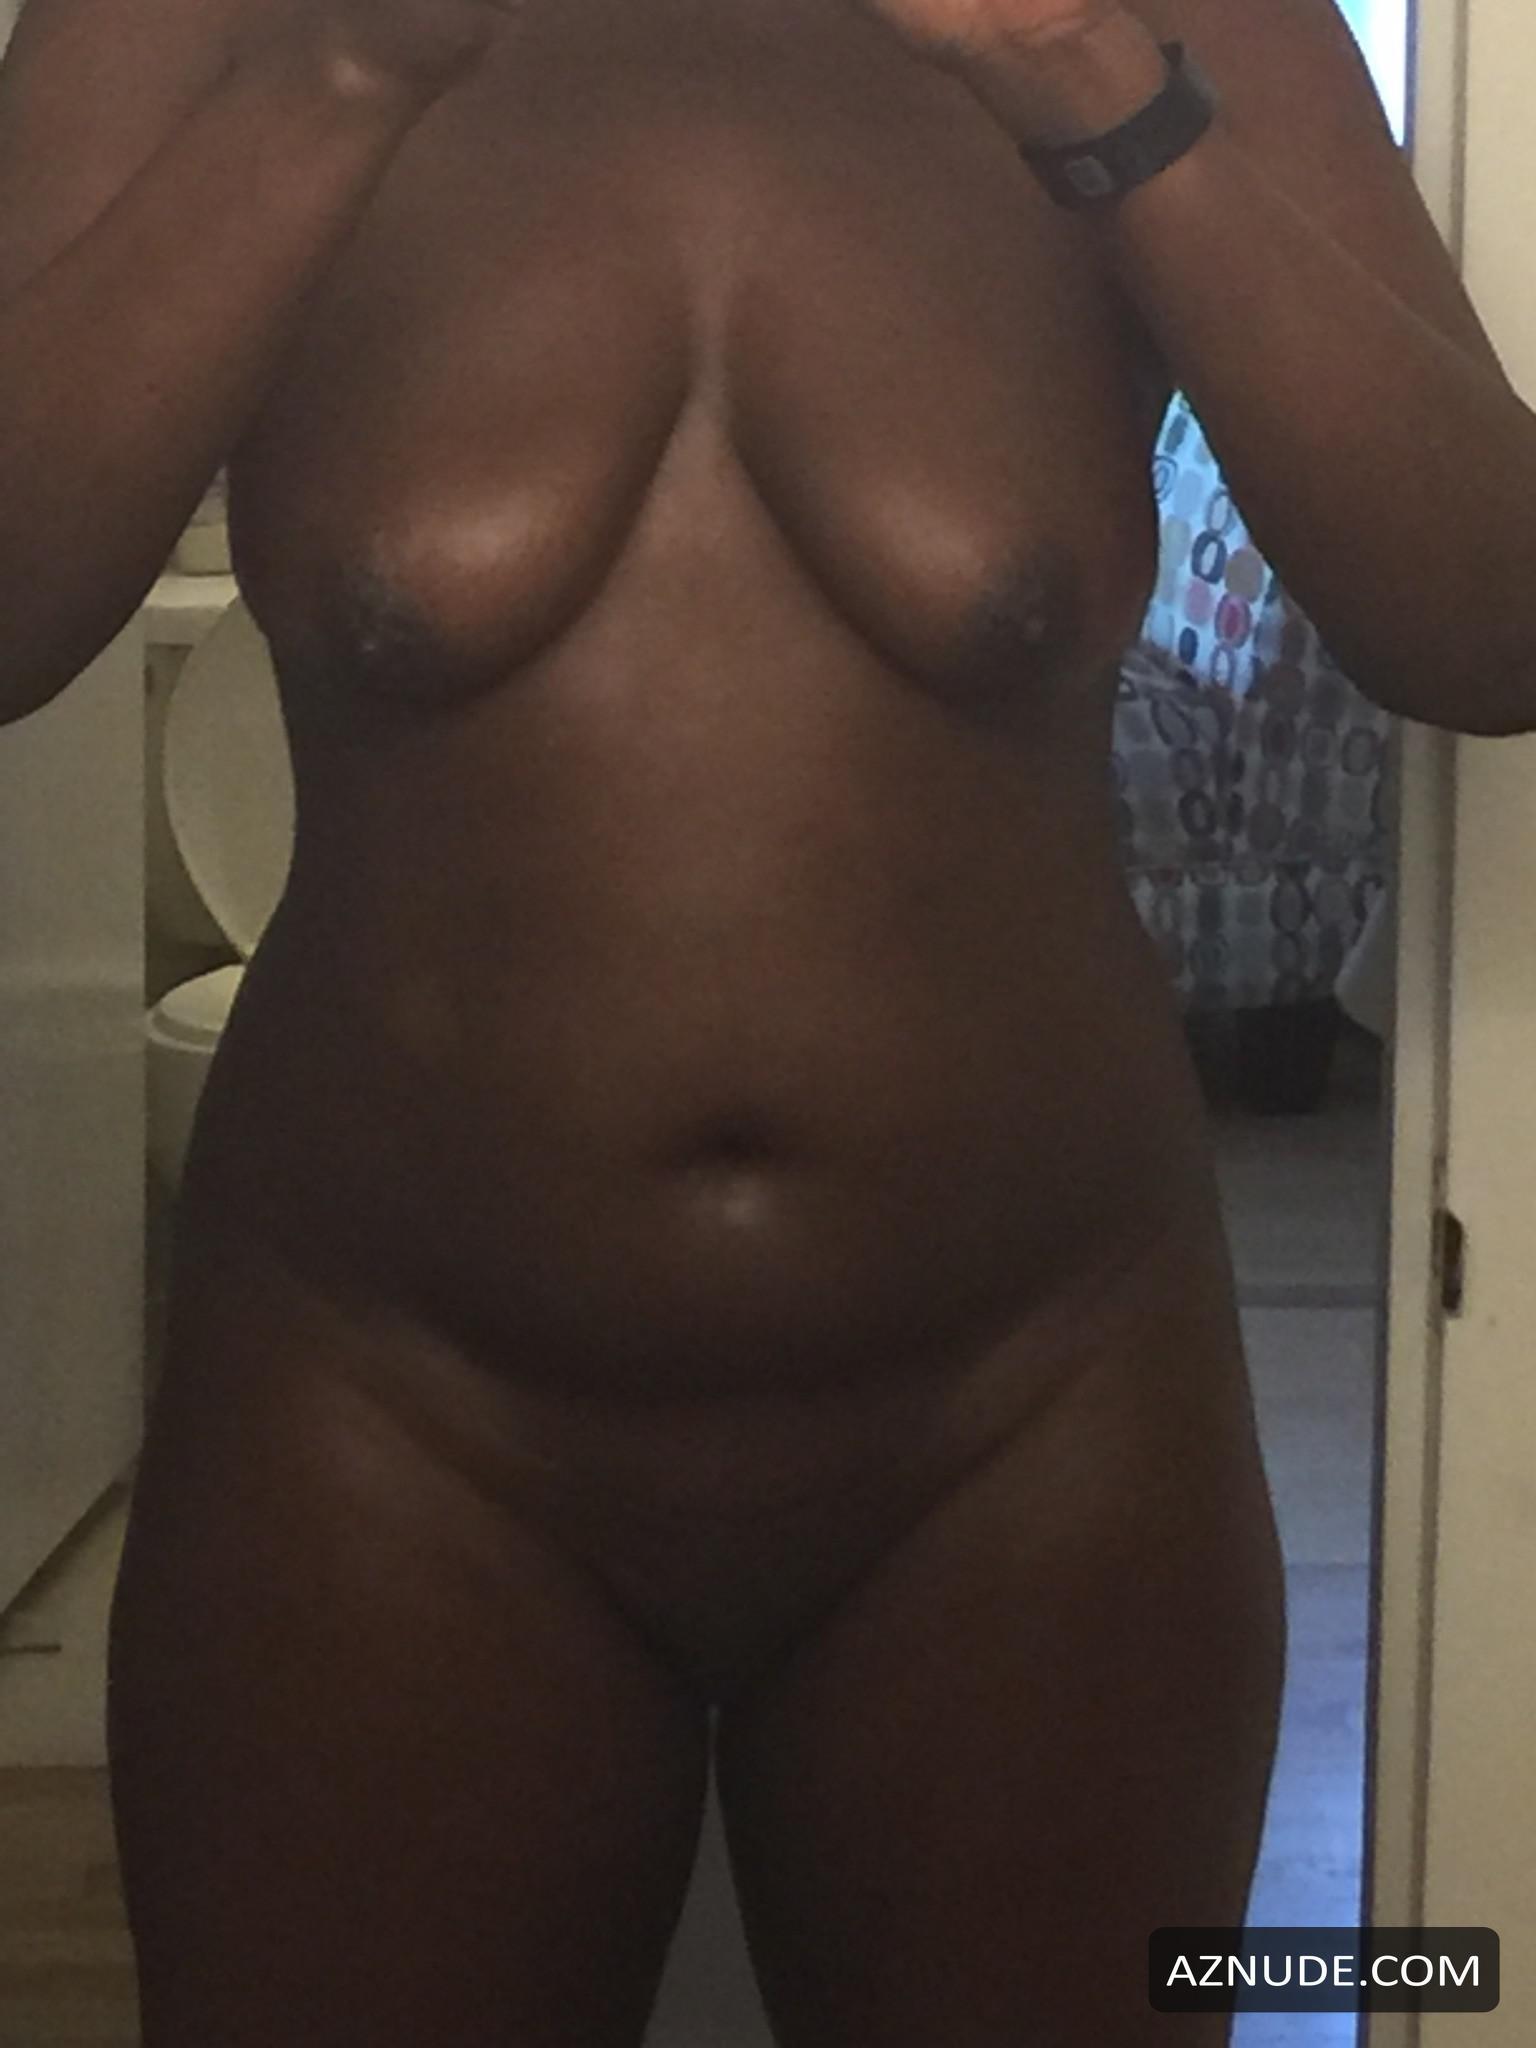 jones ass hole naked Grace